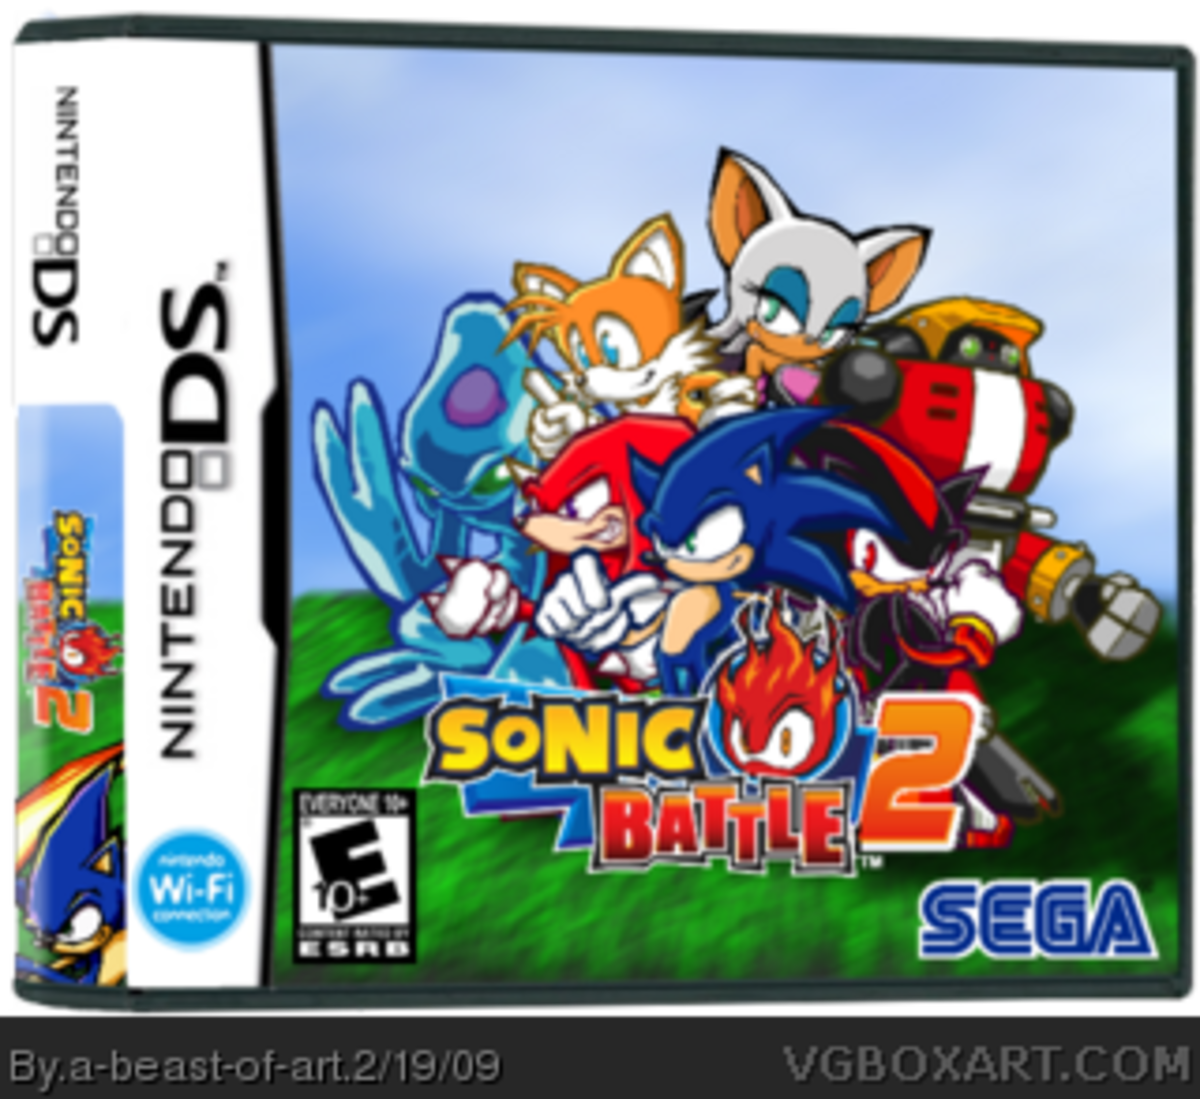 Sonic Battle 2 Box Art by a-beast-of-art